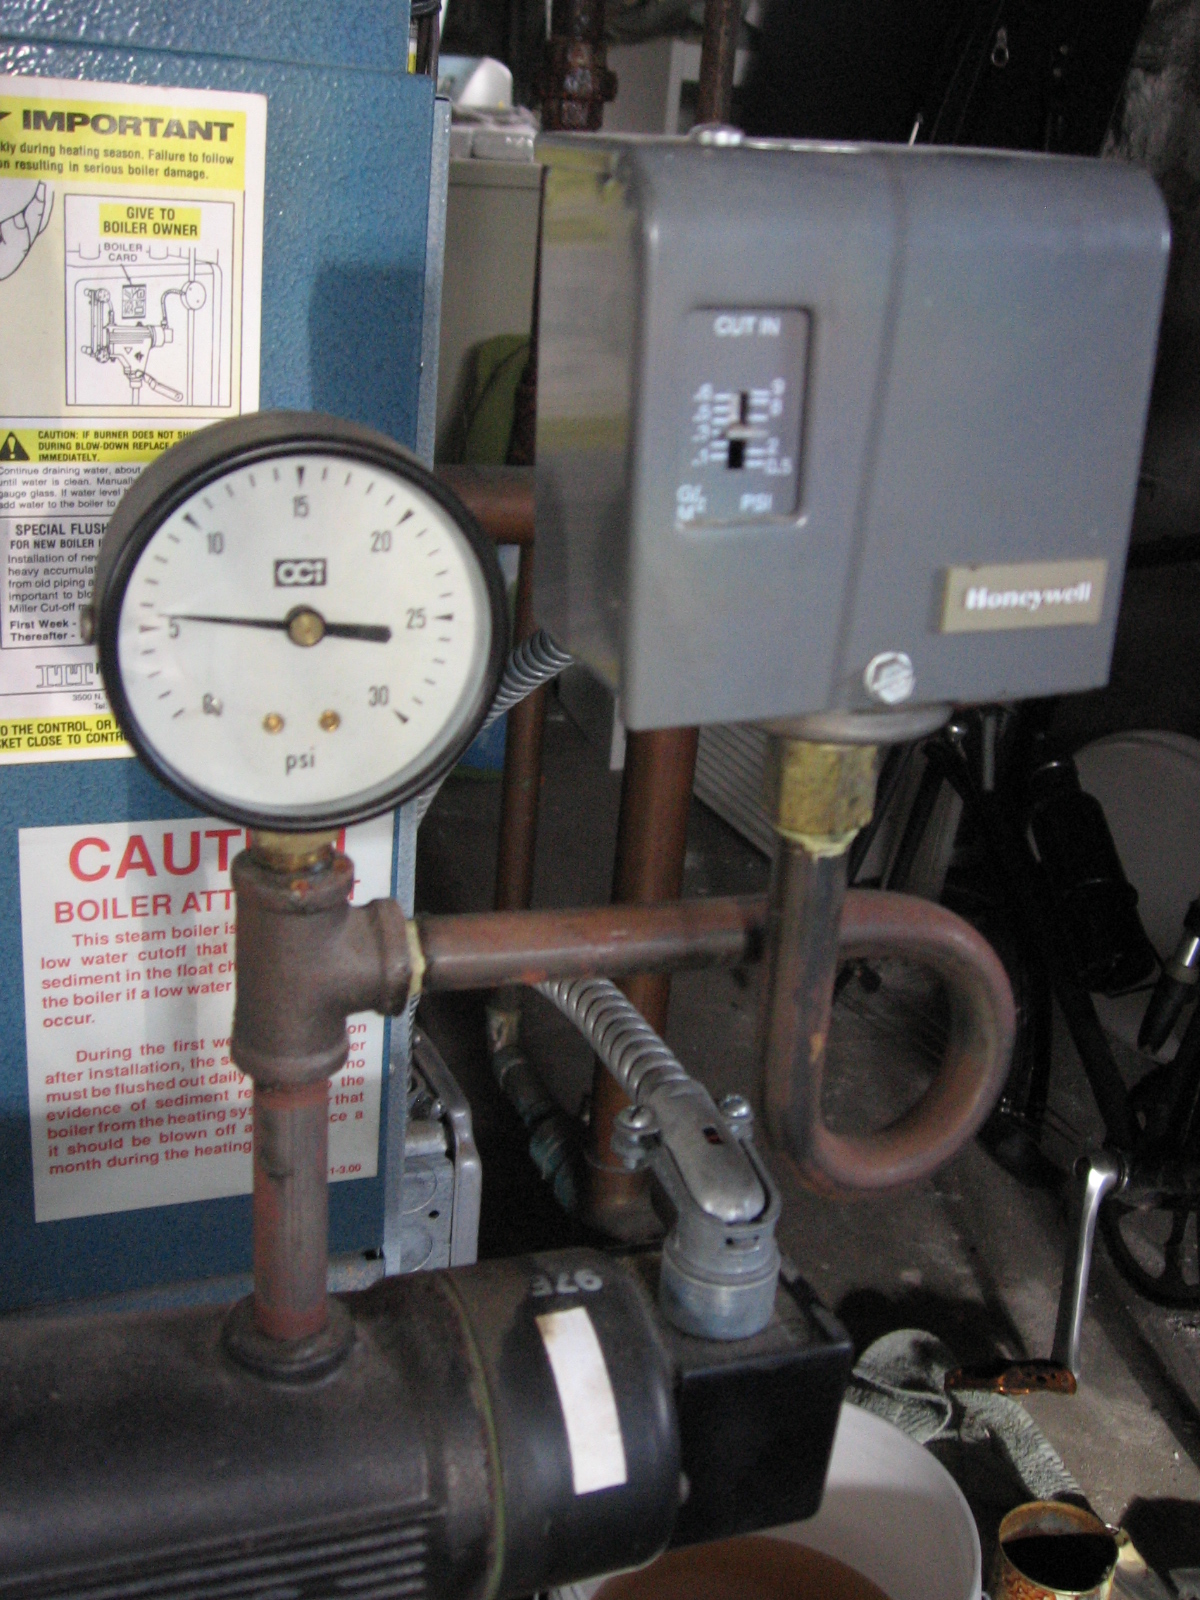 Utica Boiler Shuts Off  U2014 Heating Help  The Wall